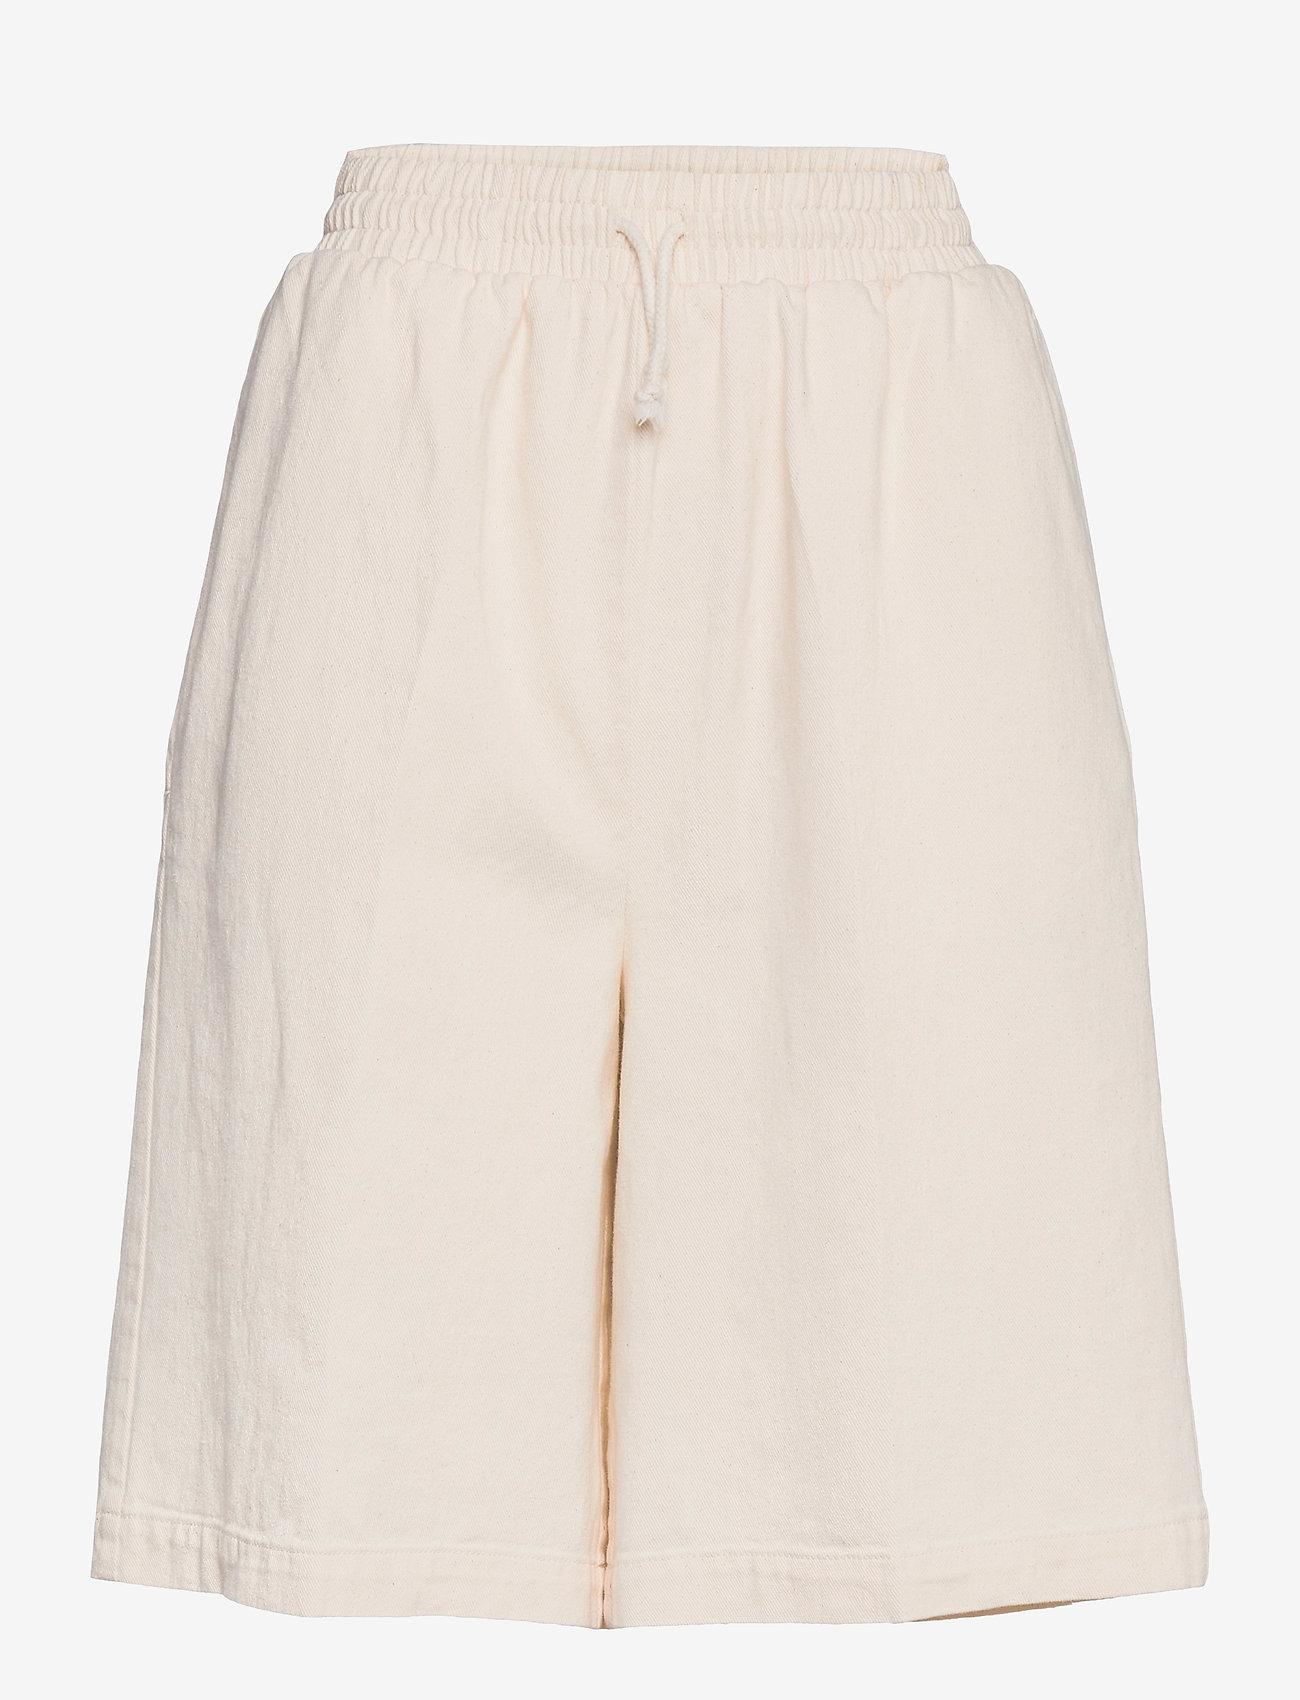 ICHI - IHGALENA SHO - casual shorts - pristine - 0